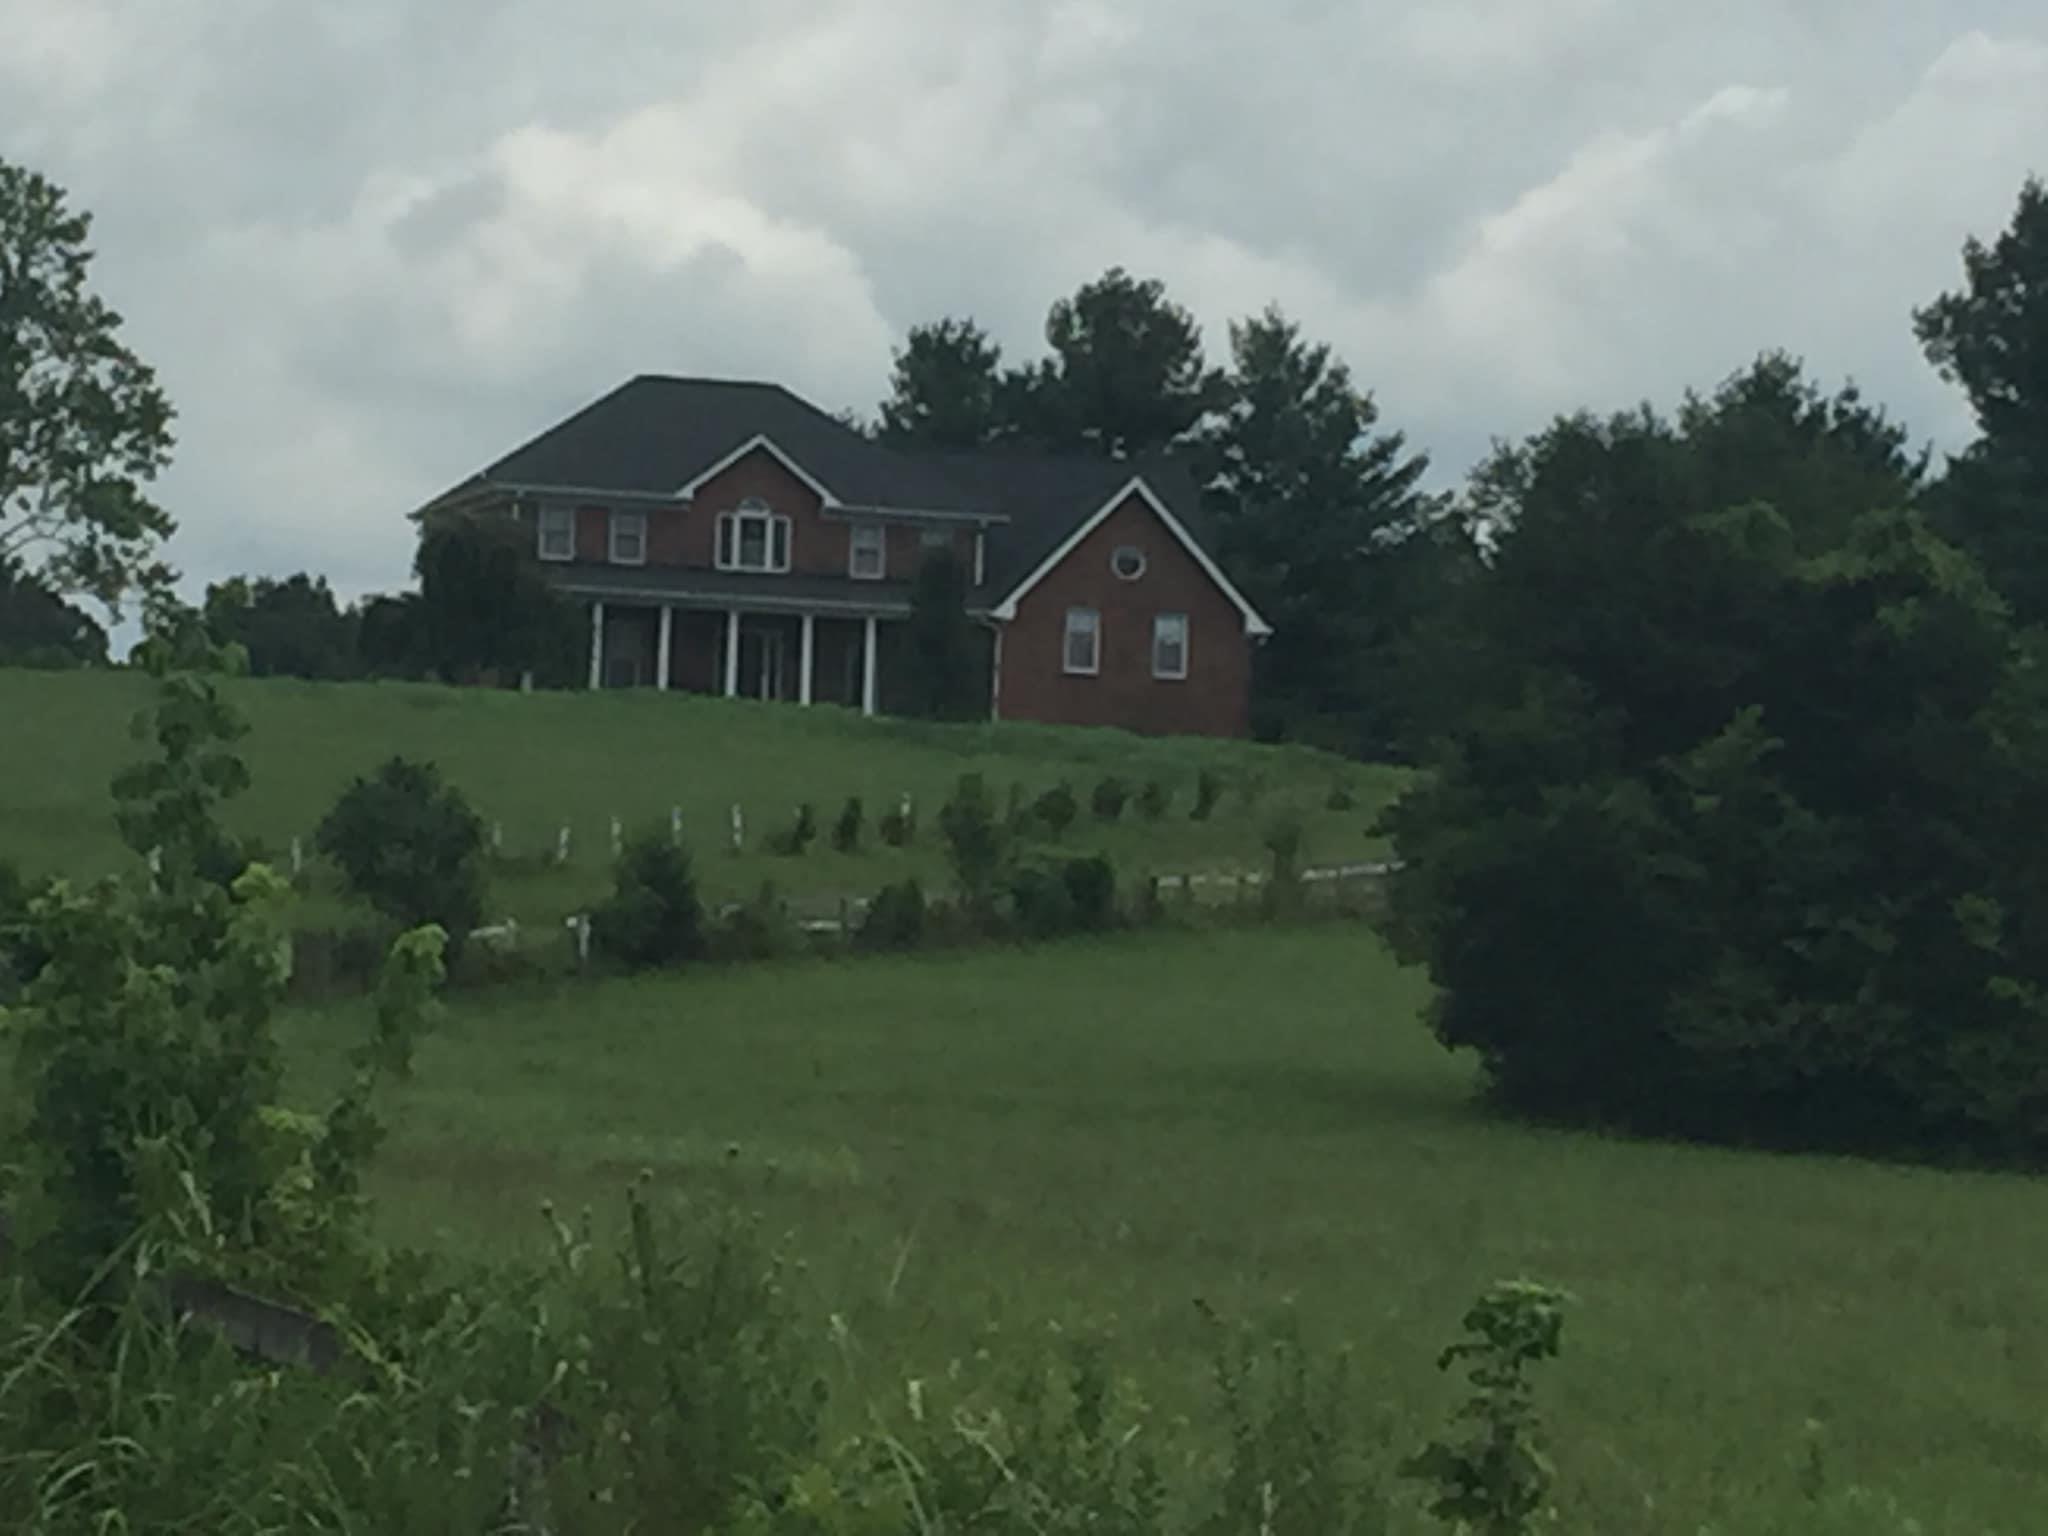 2580 25W Hwy, Cottontown, TN 37048 - Cottontown, TN real estate listing